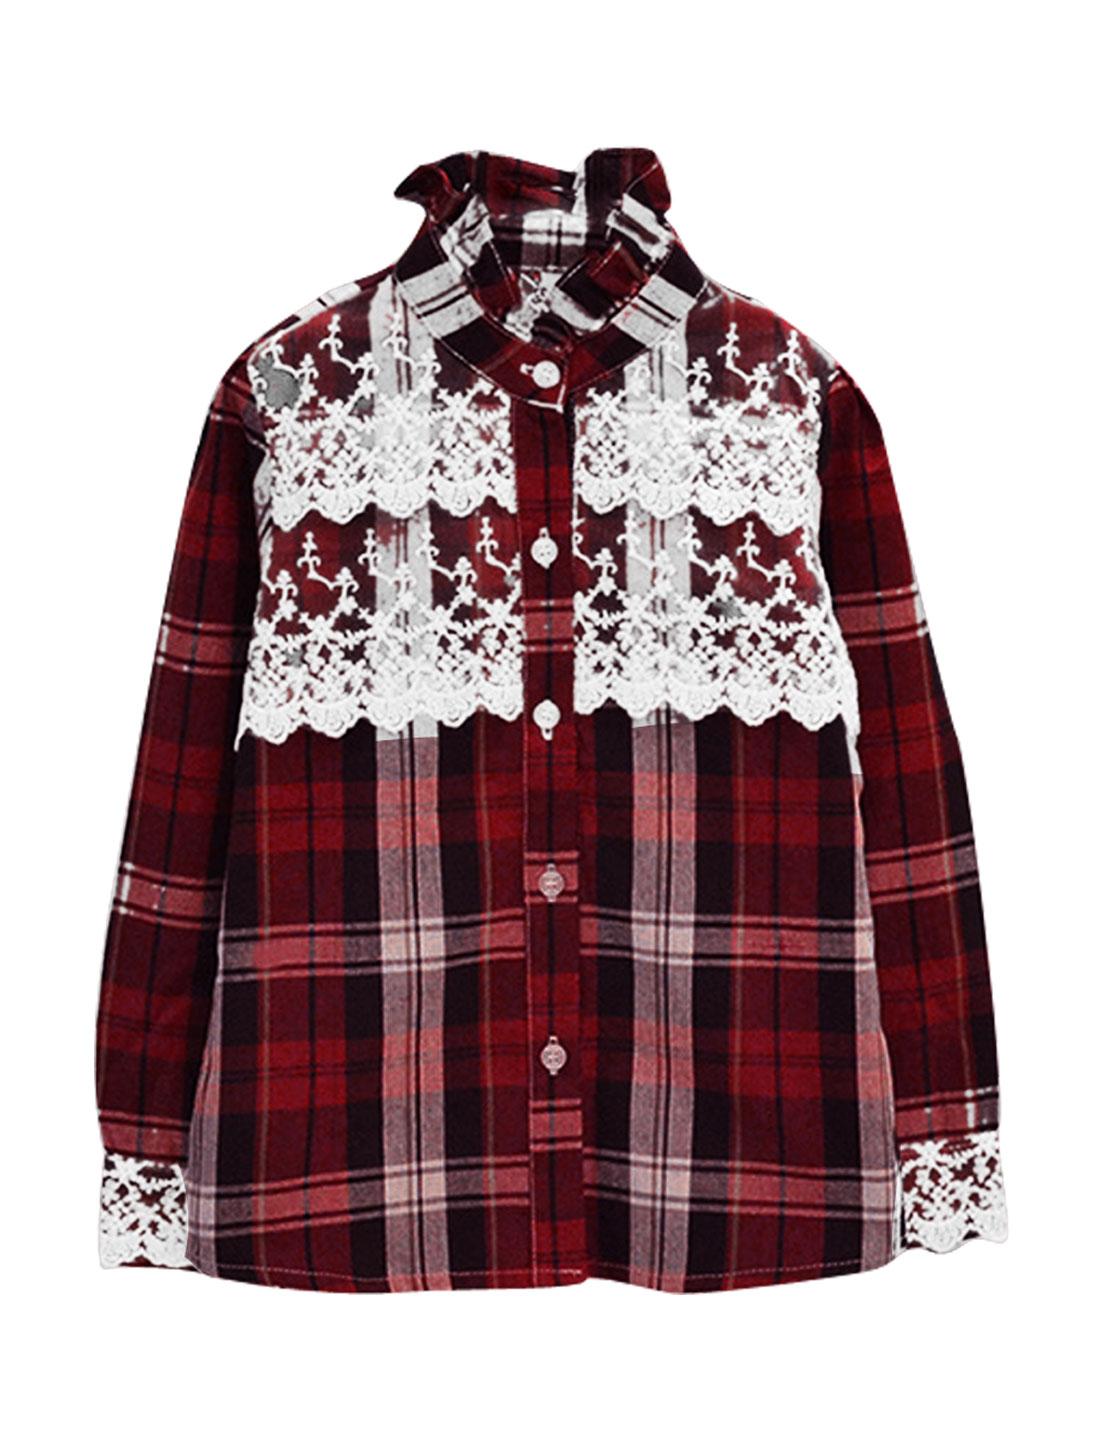 Kids Lace Splice Button Cuff Long Sleeve Plaids Pattern Shirt Burgundy US Size 8